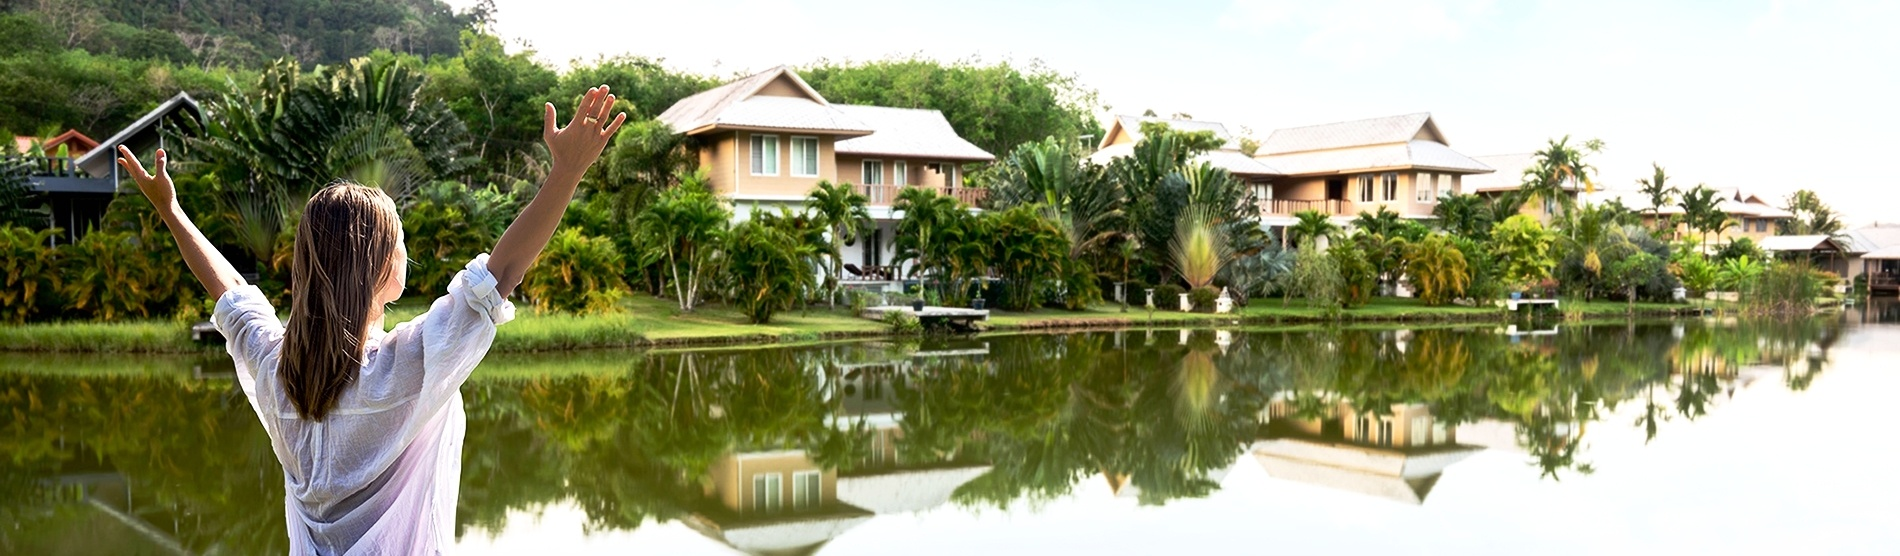 The LifeCo Phuket_Center-2-915539-edited.jpg